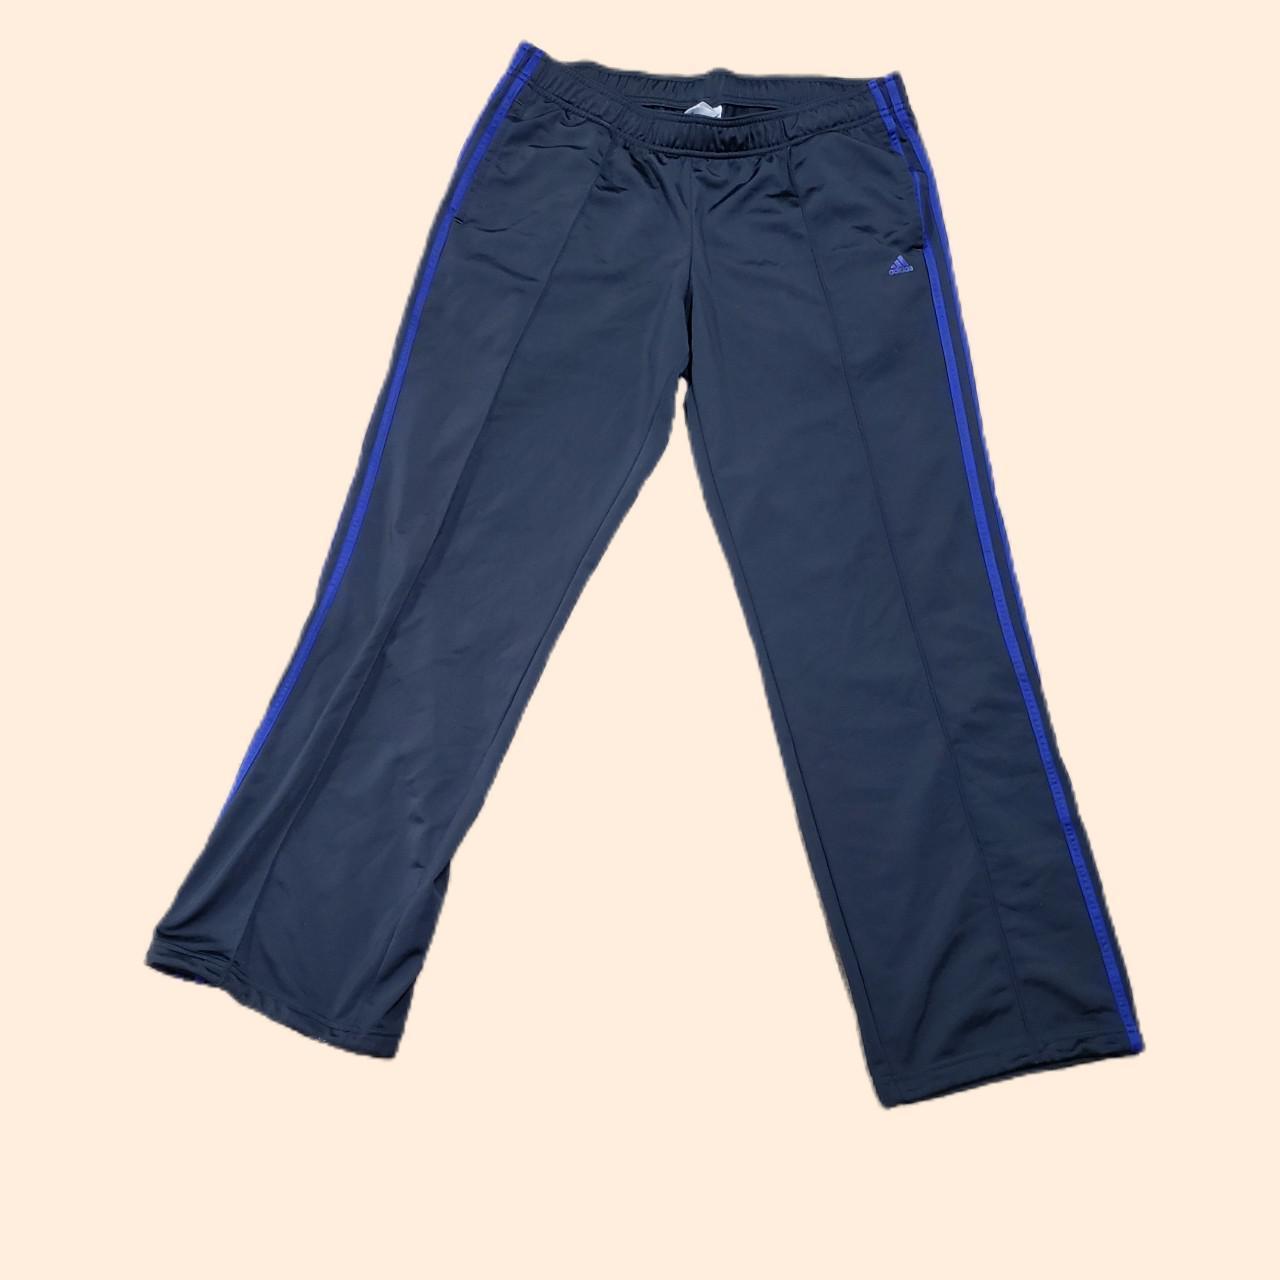 Product Image 1 - Adidas Sweats   Size: Large   Color: